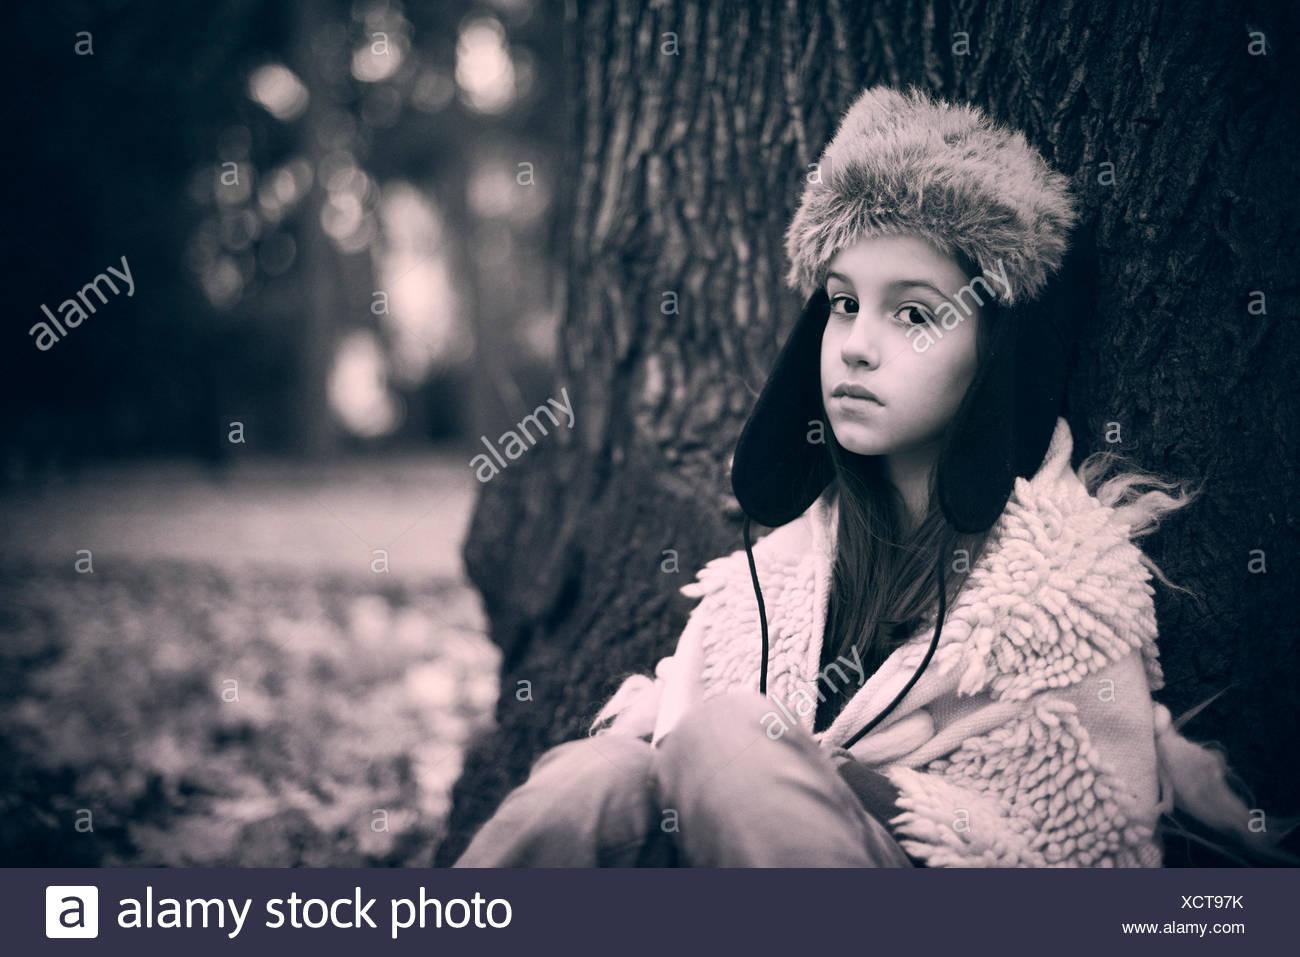 Sad girl appuyé contre un arbre Photo Stock